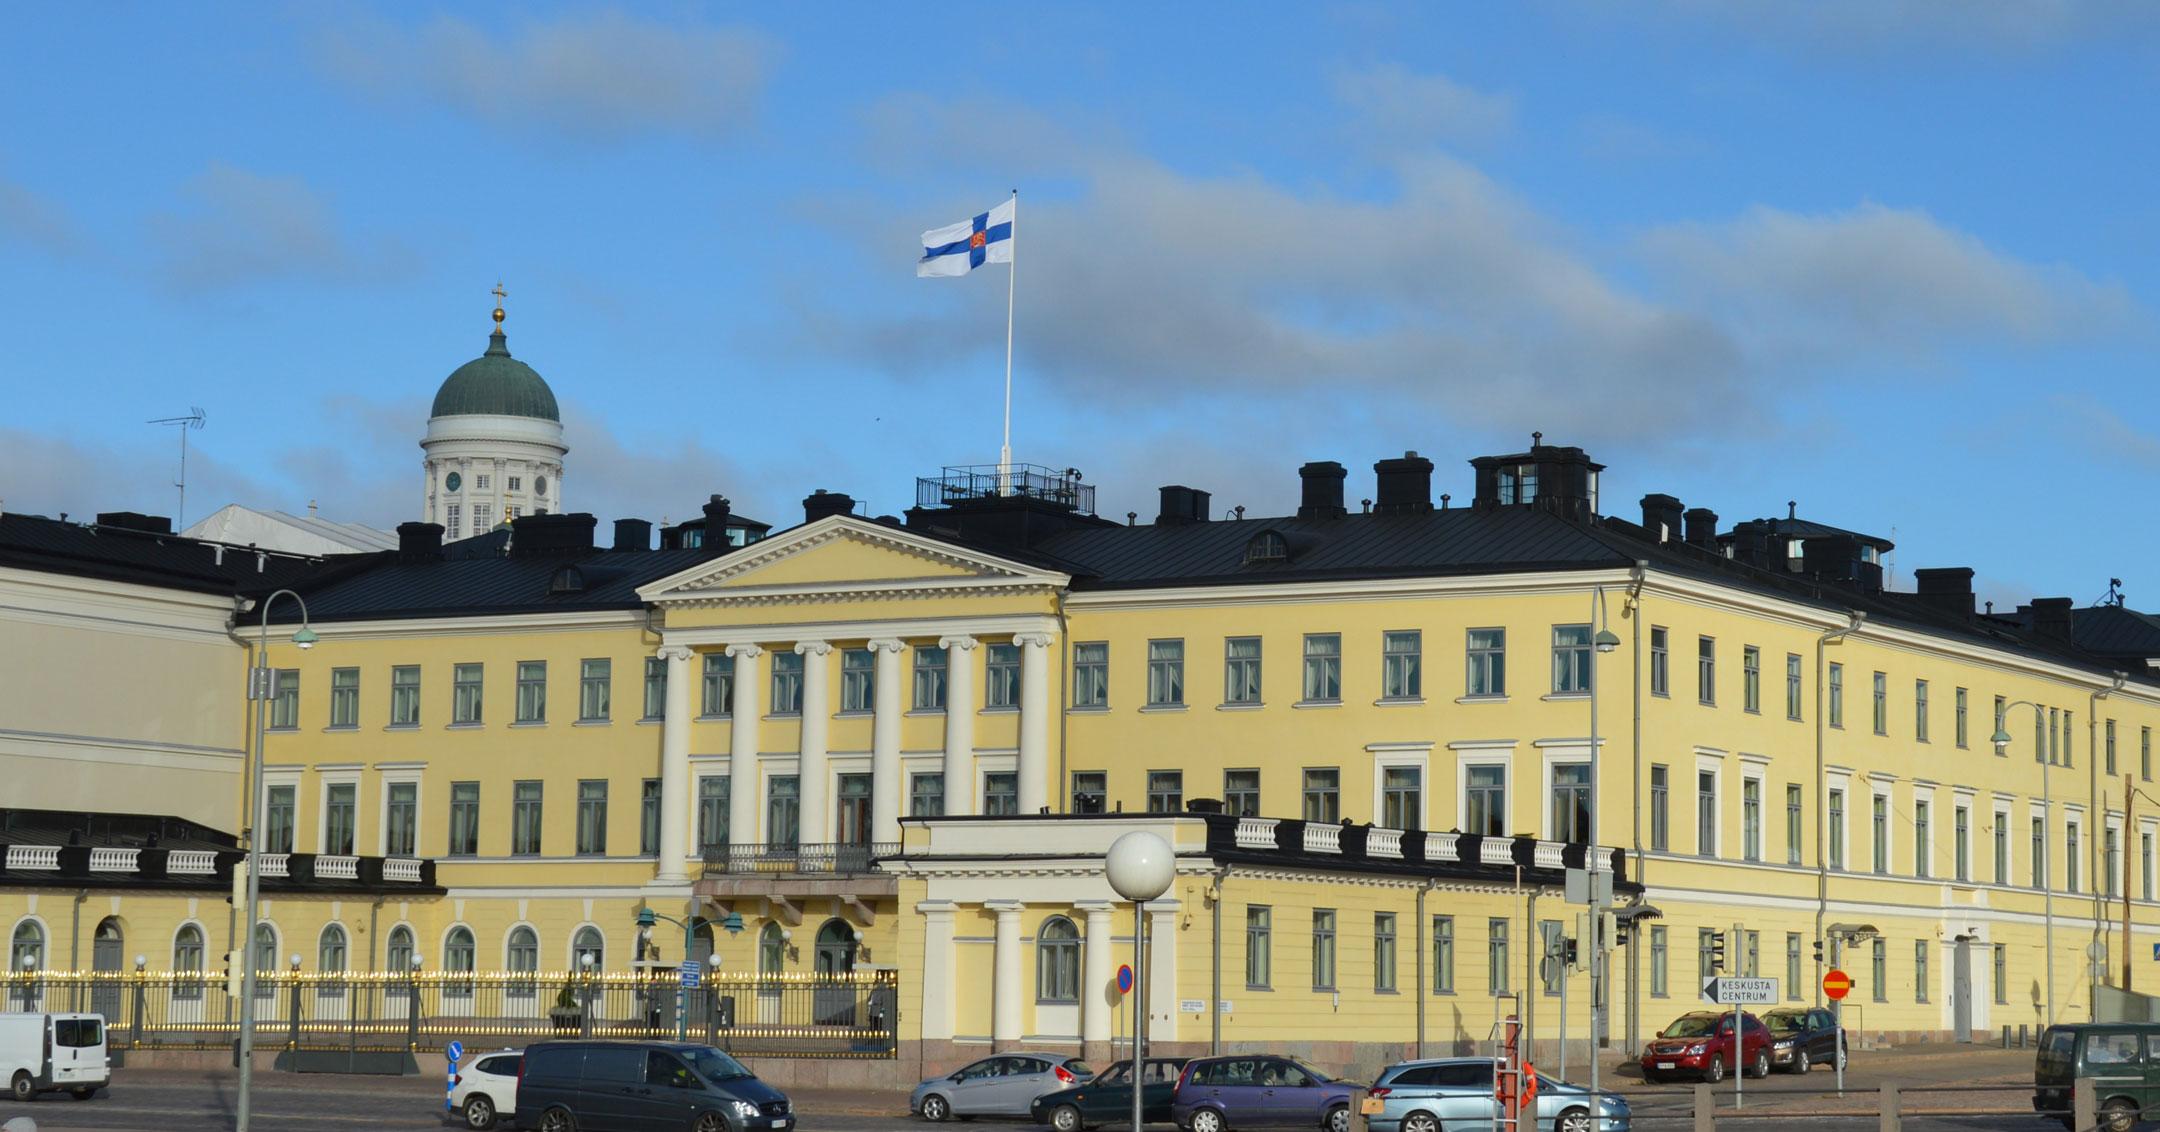 Luftfracht Hubschrauber Finnland